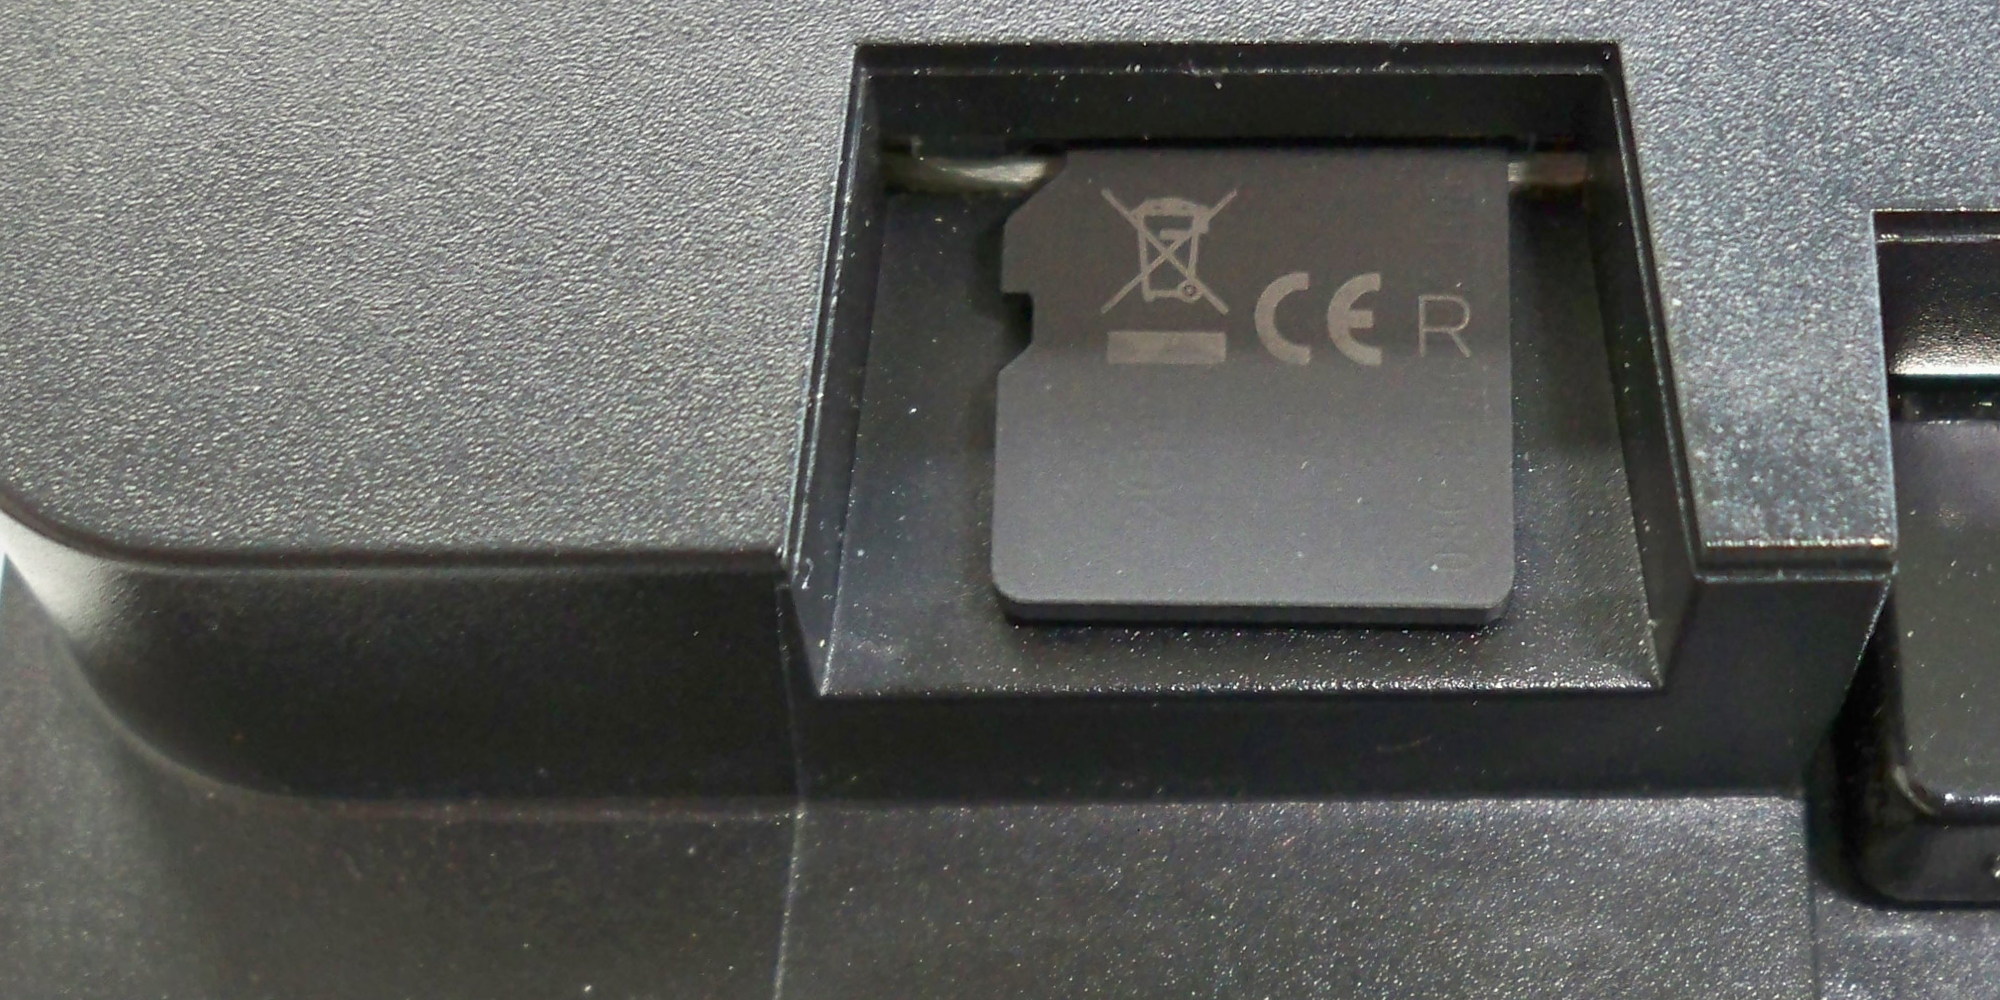 ALAN Schritt für Schritt: Einschieben der µSD-Karte an BRAIN